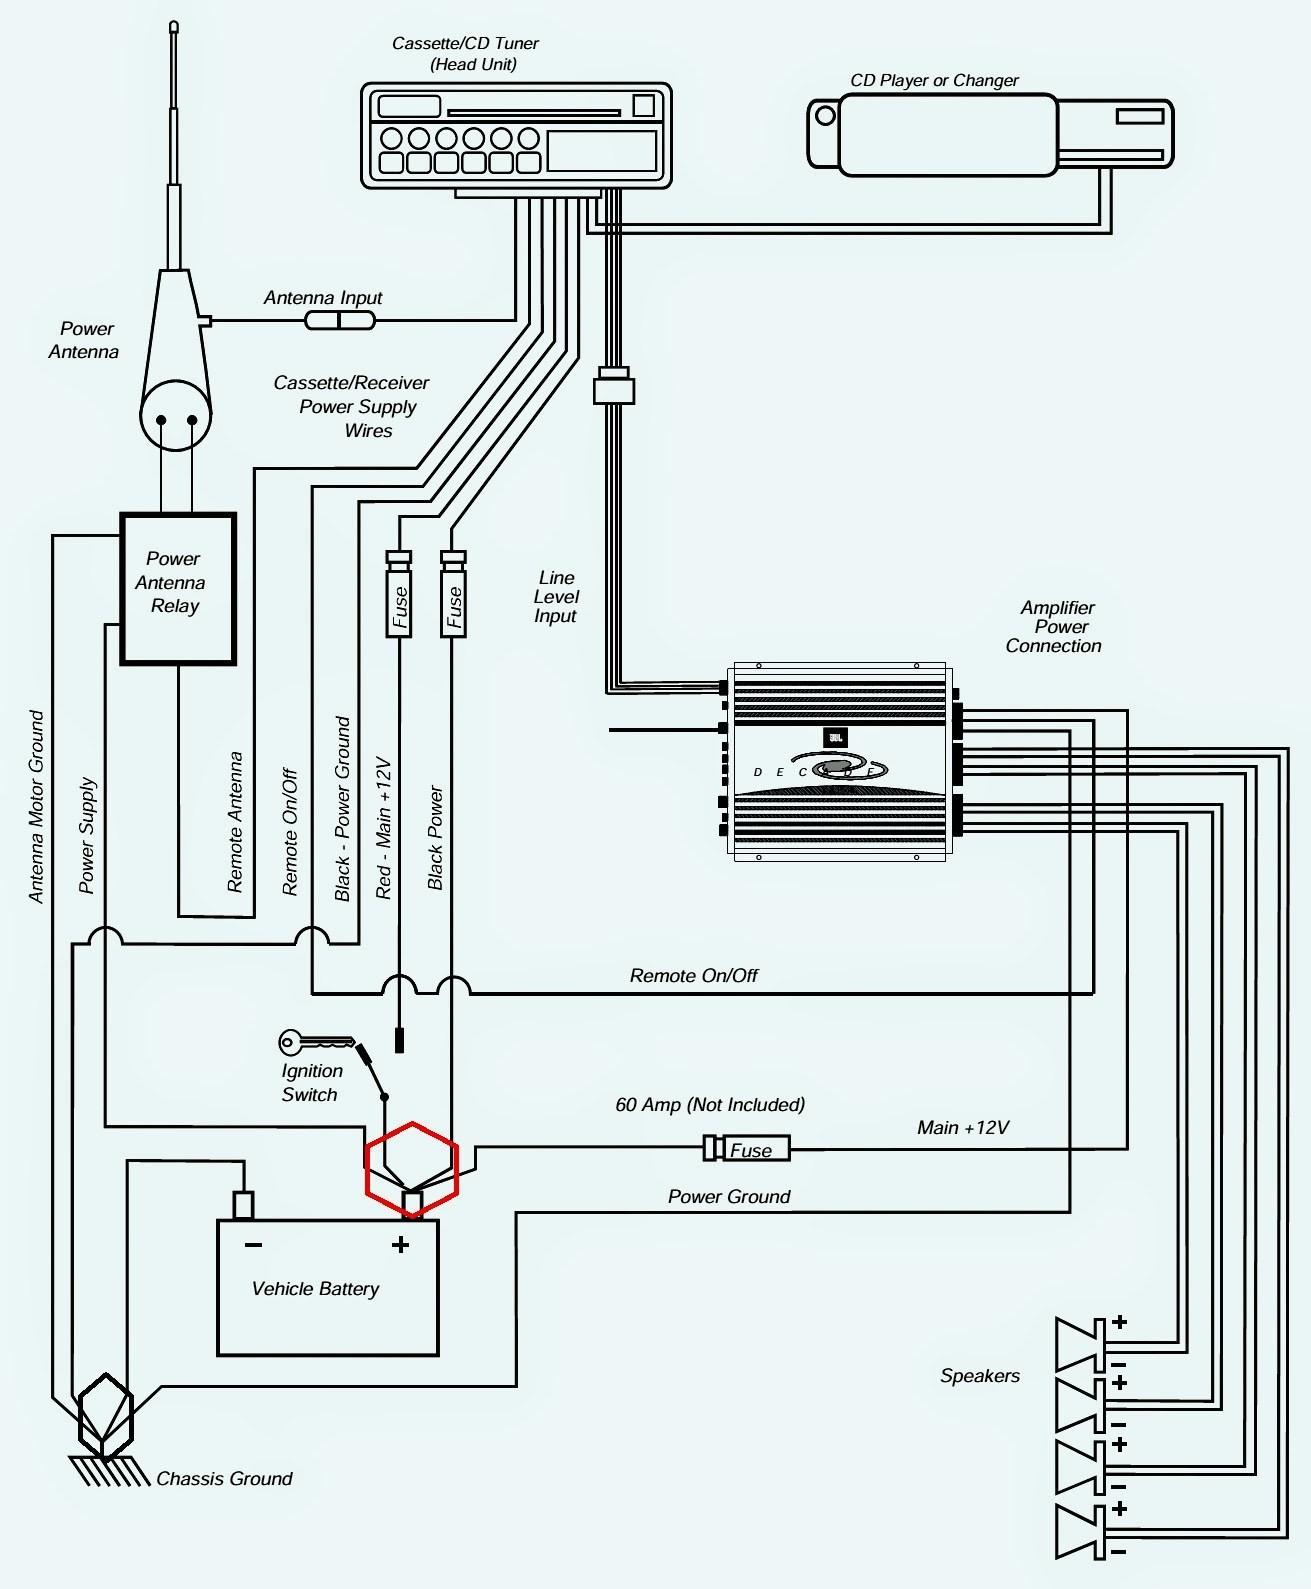 Car Radio Harness Diagram Pioneer Mosfet 50wx4 Wiring Harness Diagram Simplified Shapes Wiring Of Car Radio Harness Diagram